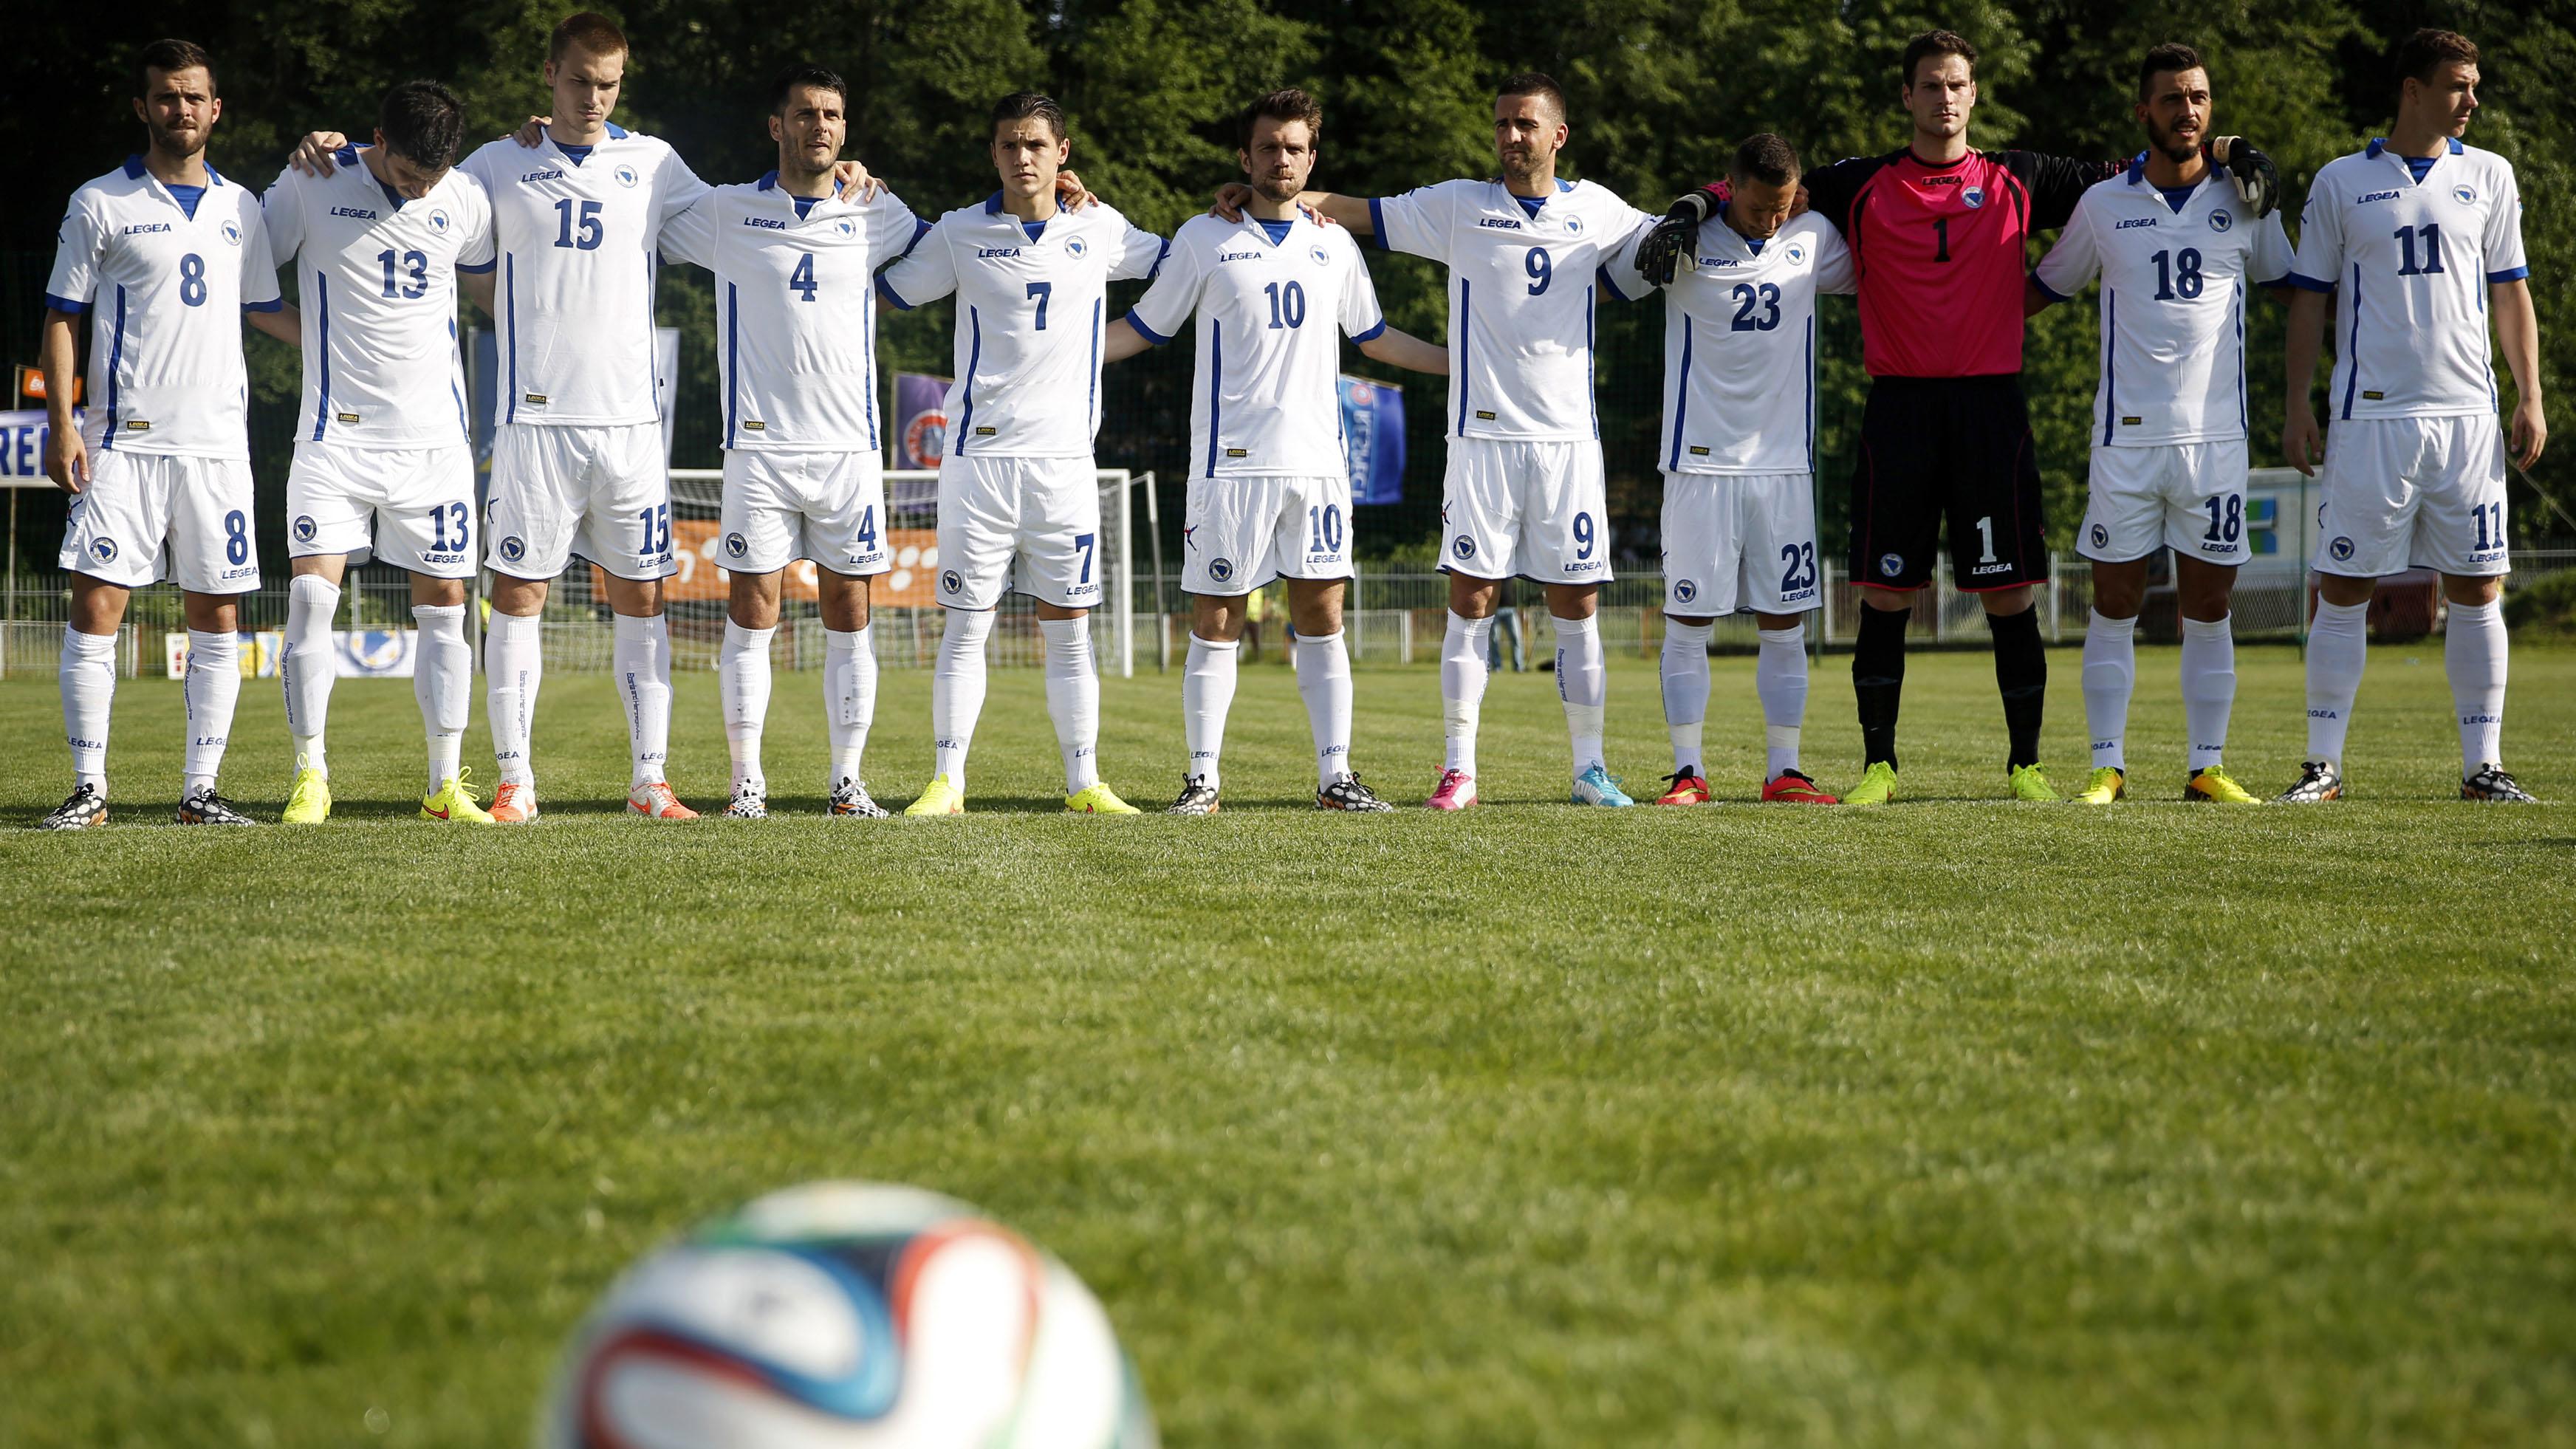 Bosnia's national soccer team players (L-R) Miralem Pjanic, Jasmin Mujdza, Toni Sunjic, Emir Spahic, Tino-Sven Susic, Zvjezdan Misimovic, Vedad Ibisevic, Sejad Salihovic, Asmir Begovic, Haris Medunjanin and Edin Dzeko